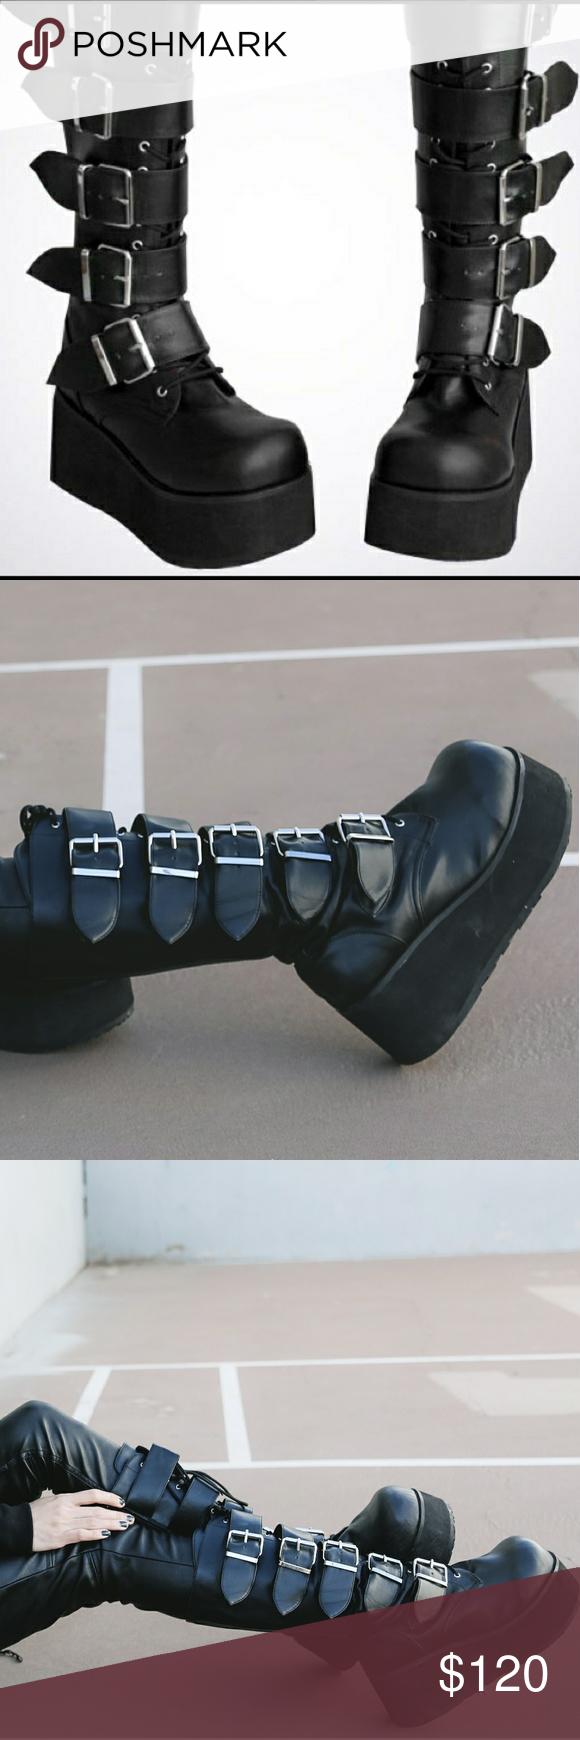 d9d2e1bdf5d Demonia Trashville 518 Platform Buckle Boots Goth Knee high platform boots  with five wide buckle straps